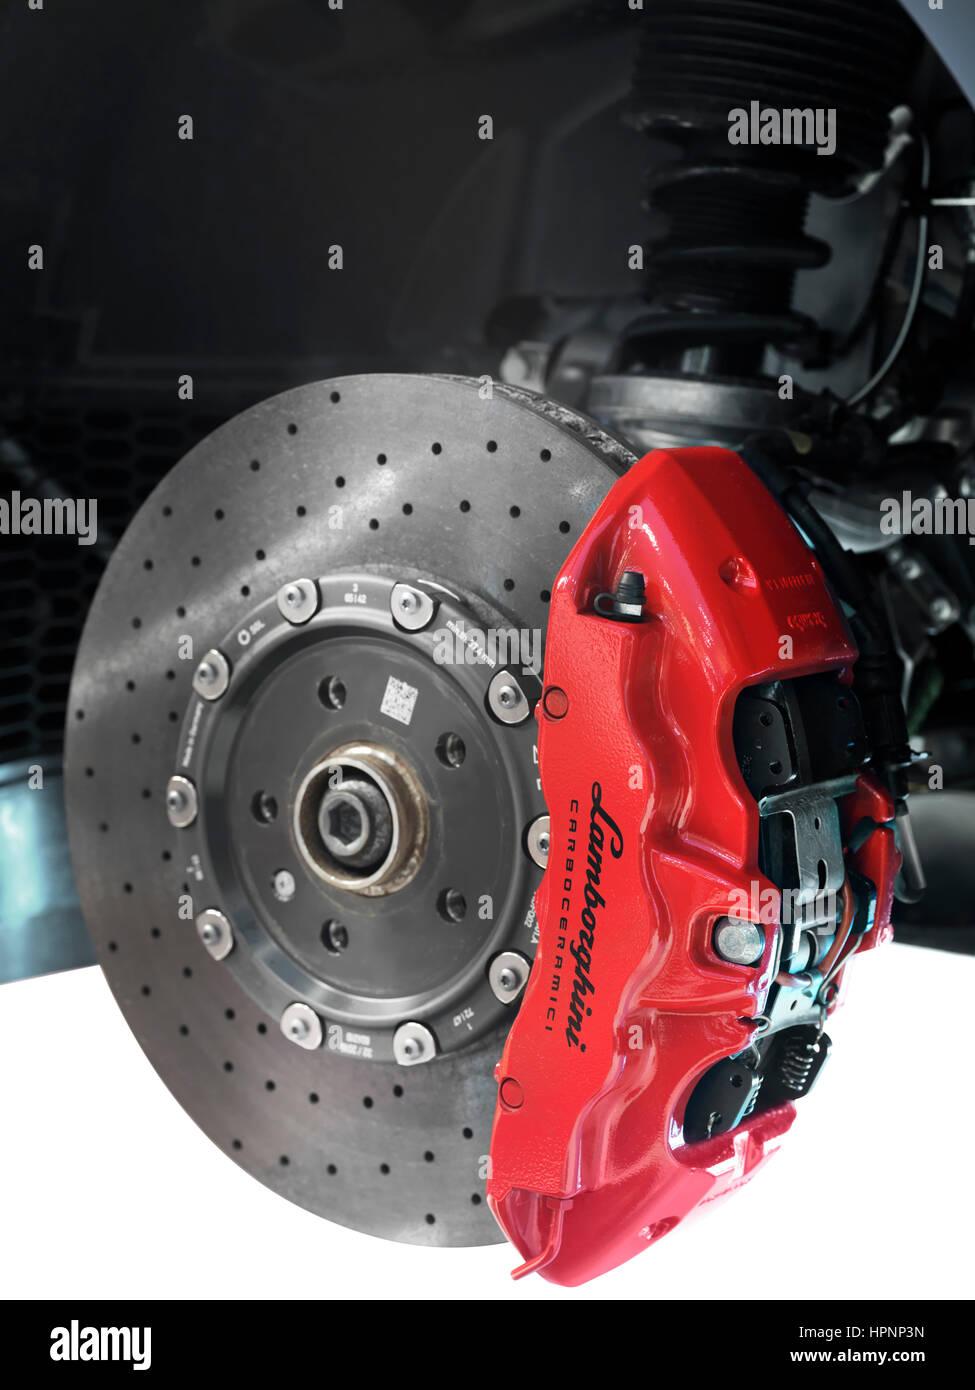 Closeup of Lamborghini sports car front ceramic brakes, a disc and a caliper - Stock Image